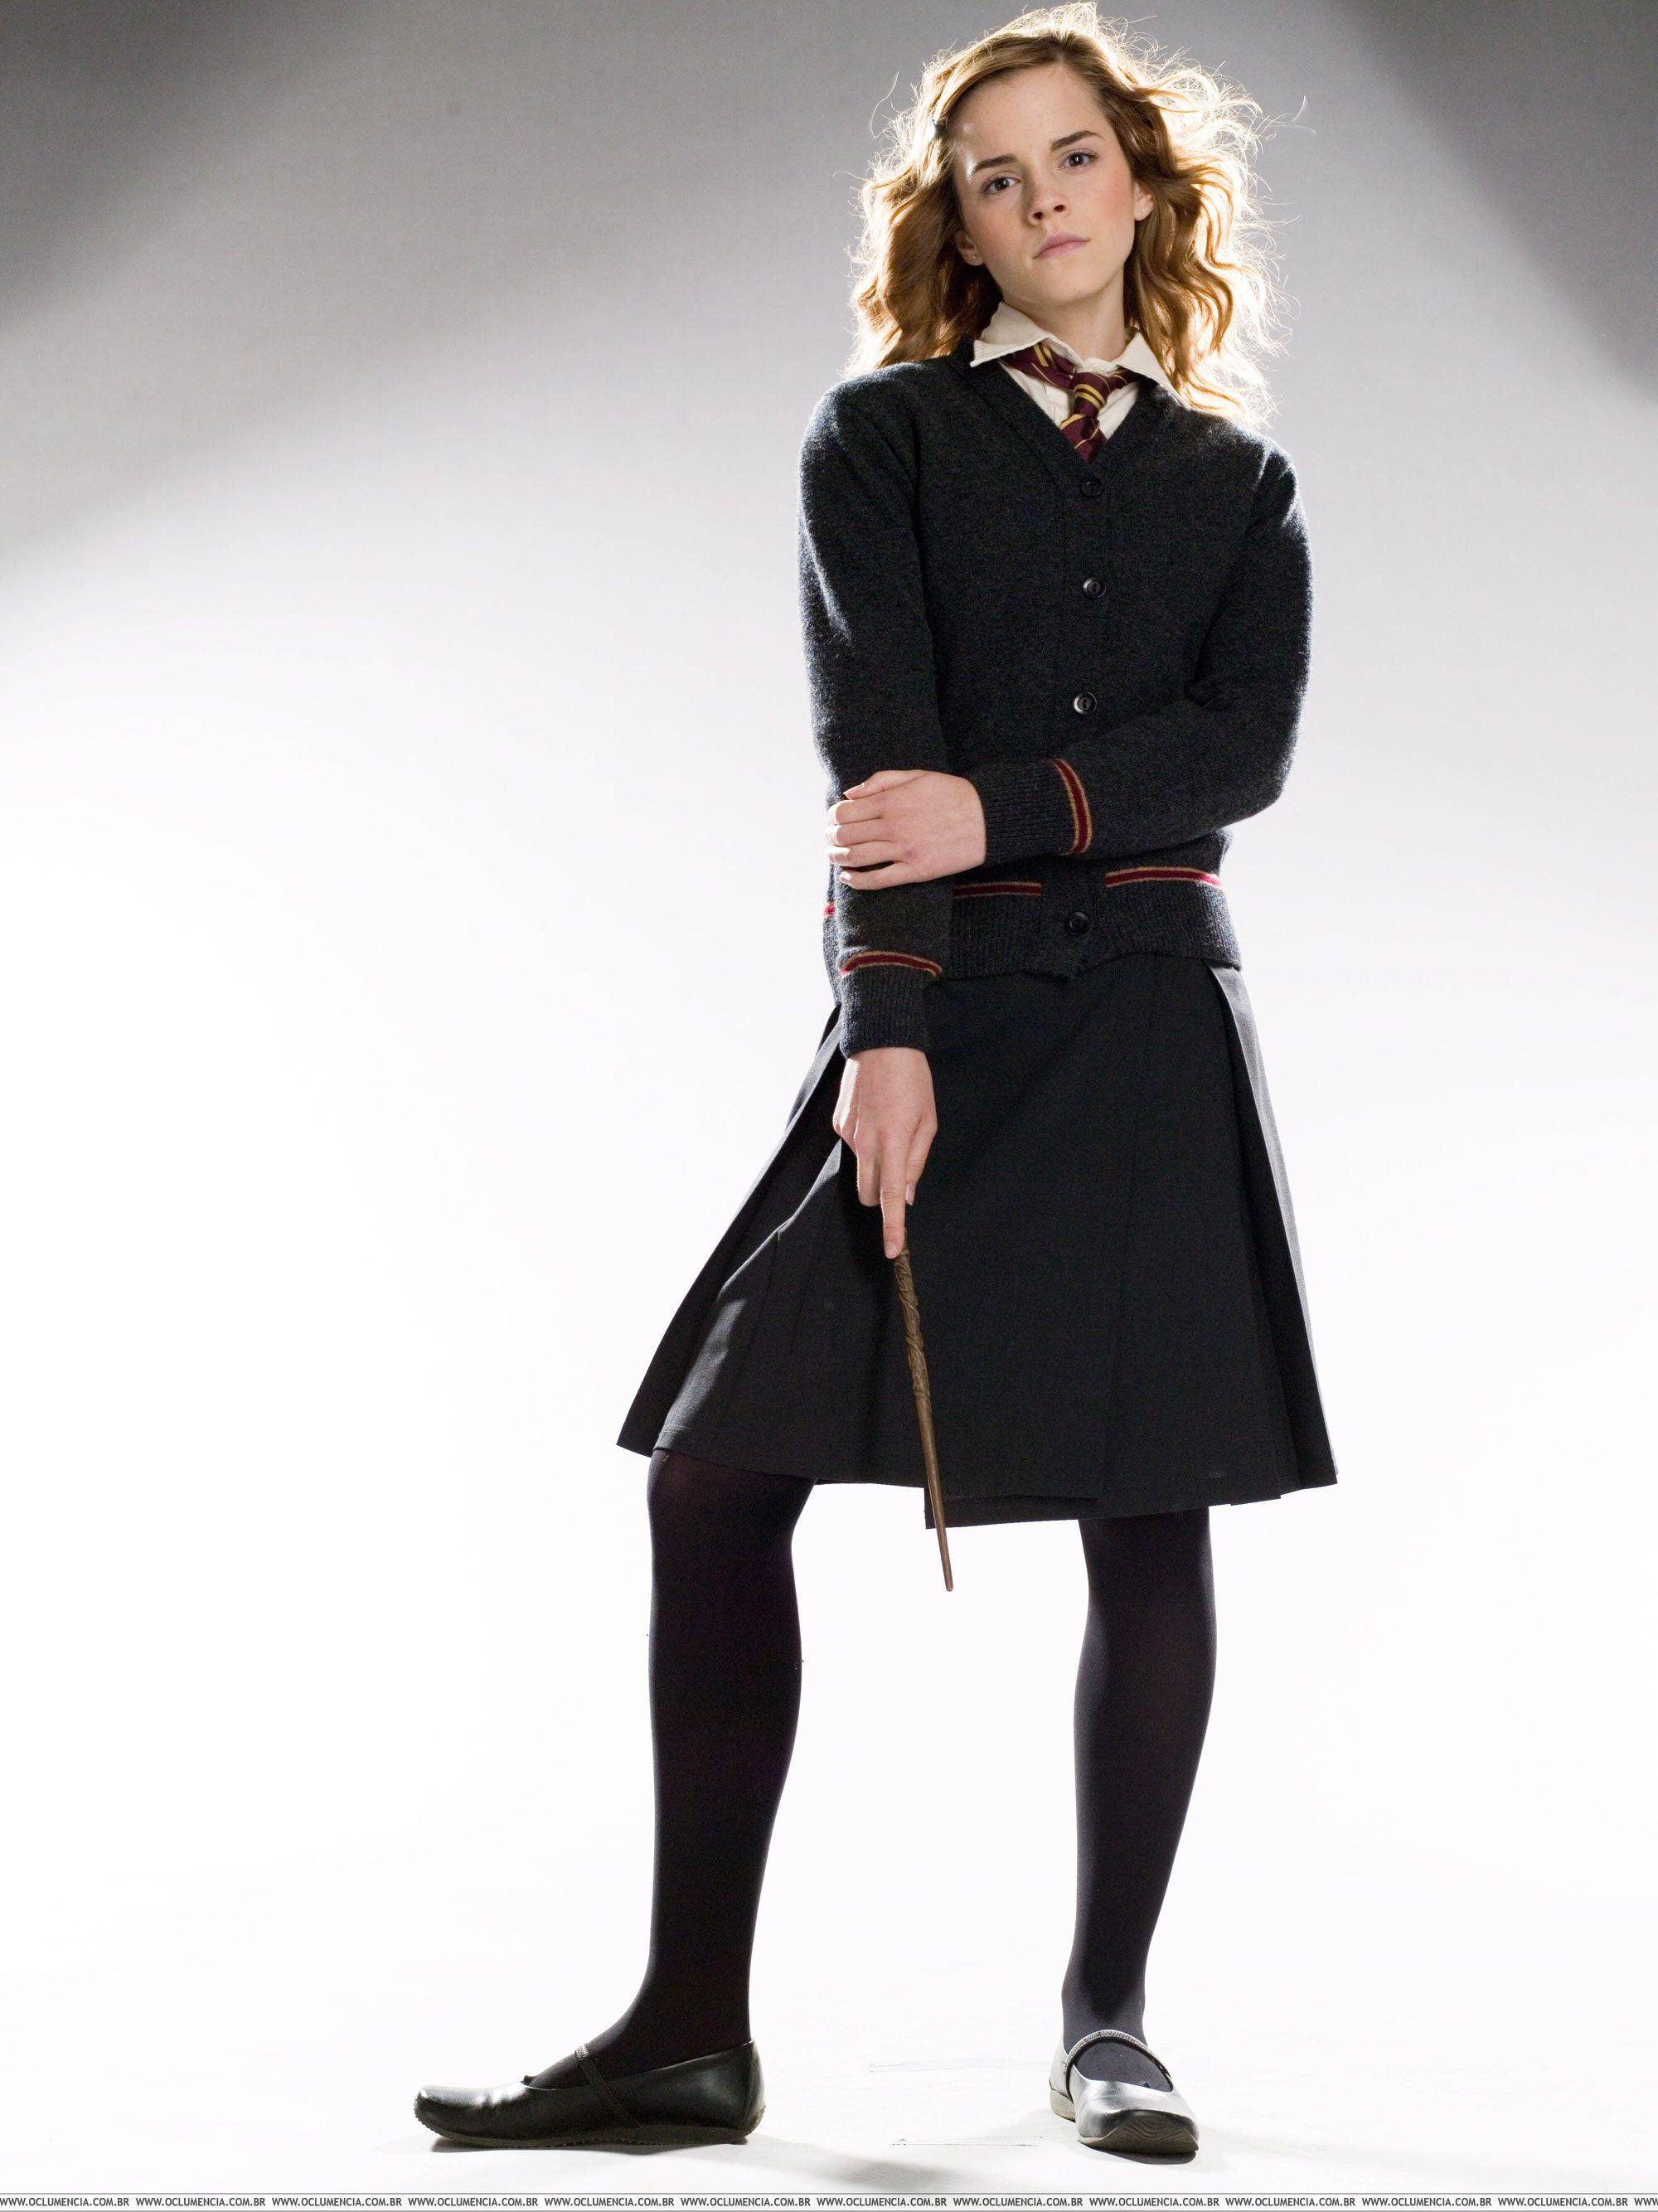 Hermione Granger Photoshoot Hermine Granger Hermine Granger Kostum Hermine